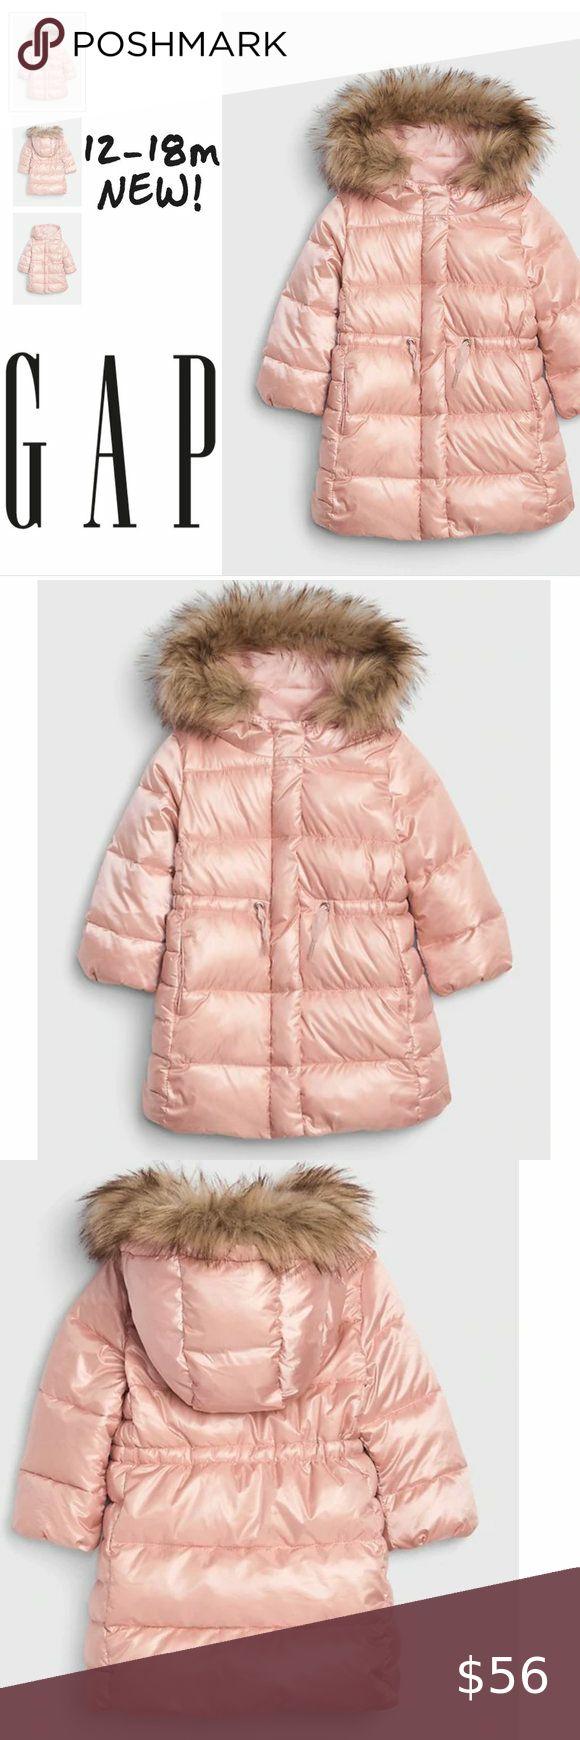 Gap Toddler Coldcontrol Max Long Puffer Pink 12 18 Long Puffer Girls Puffer Jacket Kids Coats Girls [ 1740 x 580 Pixel ]